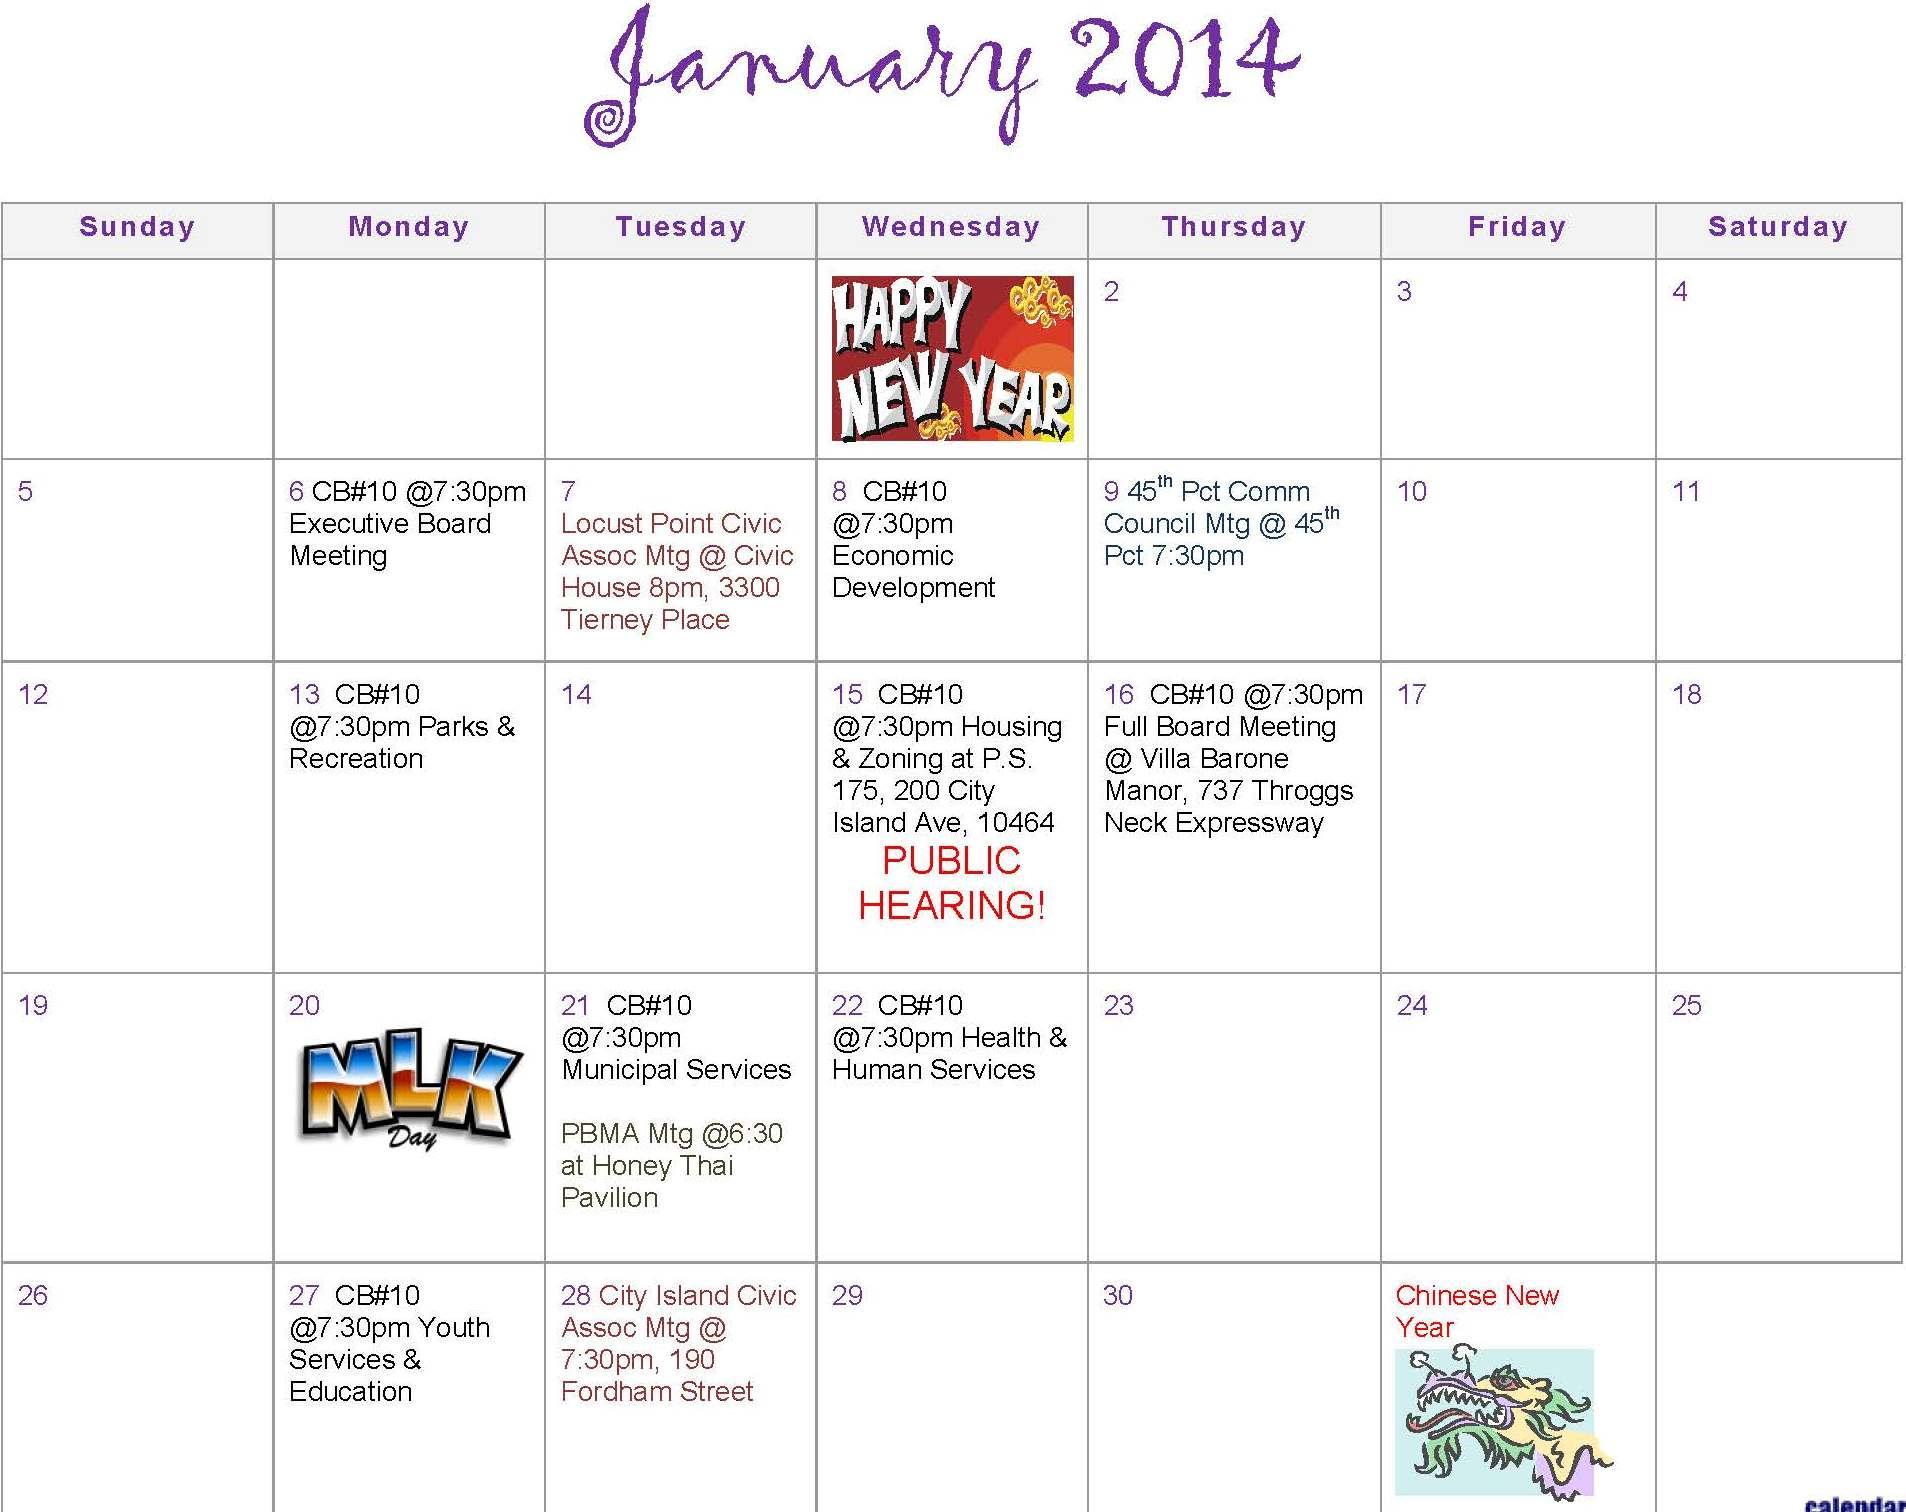 Community Board 10 Meeting Schedule